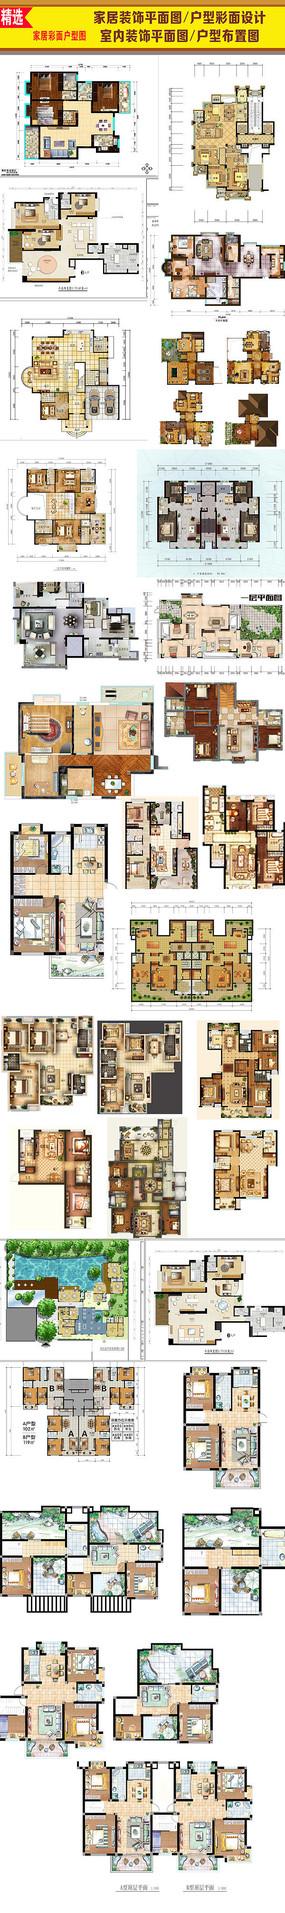 PSD分层室内装饰平面图